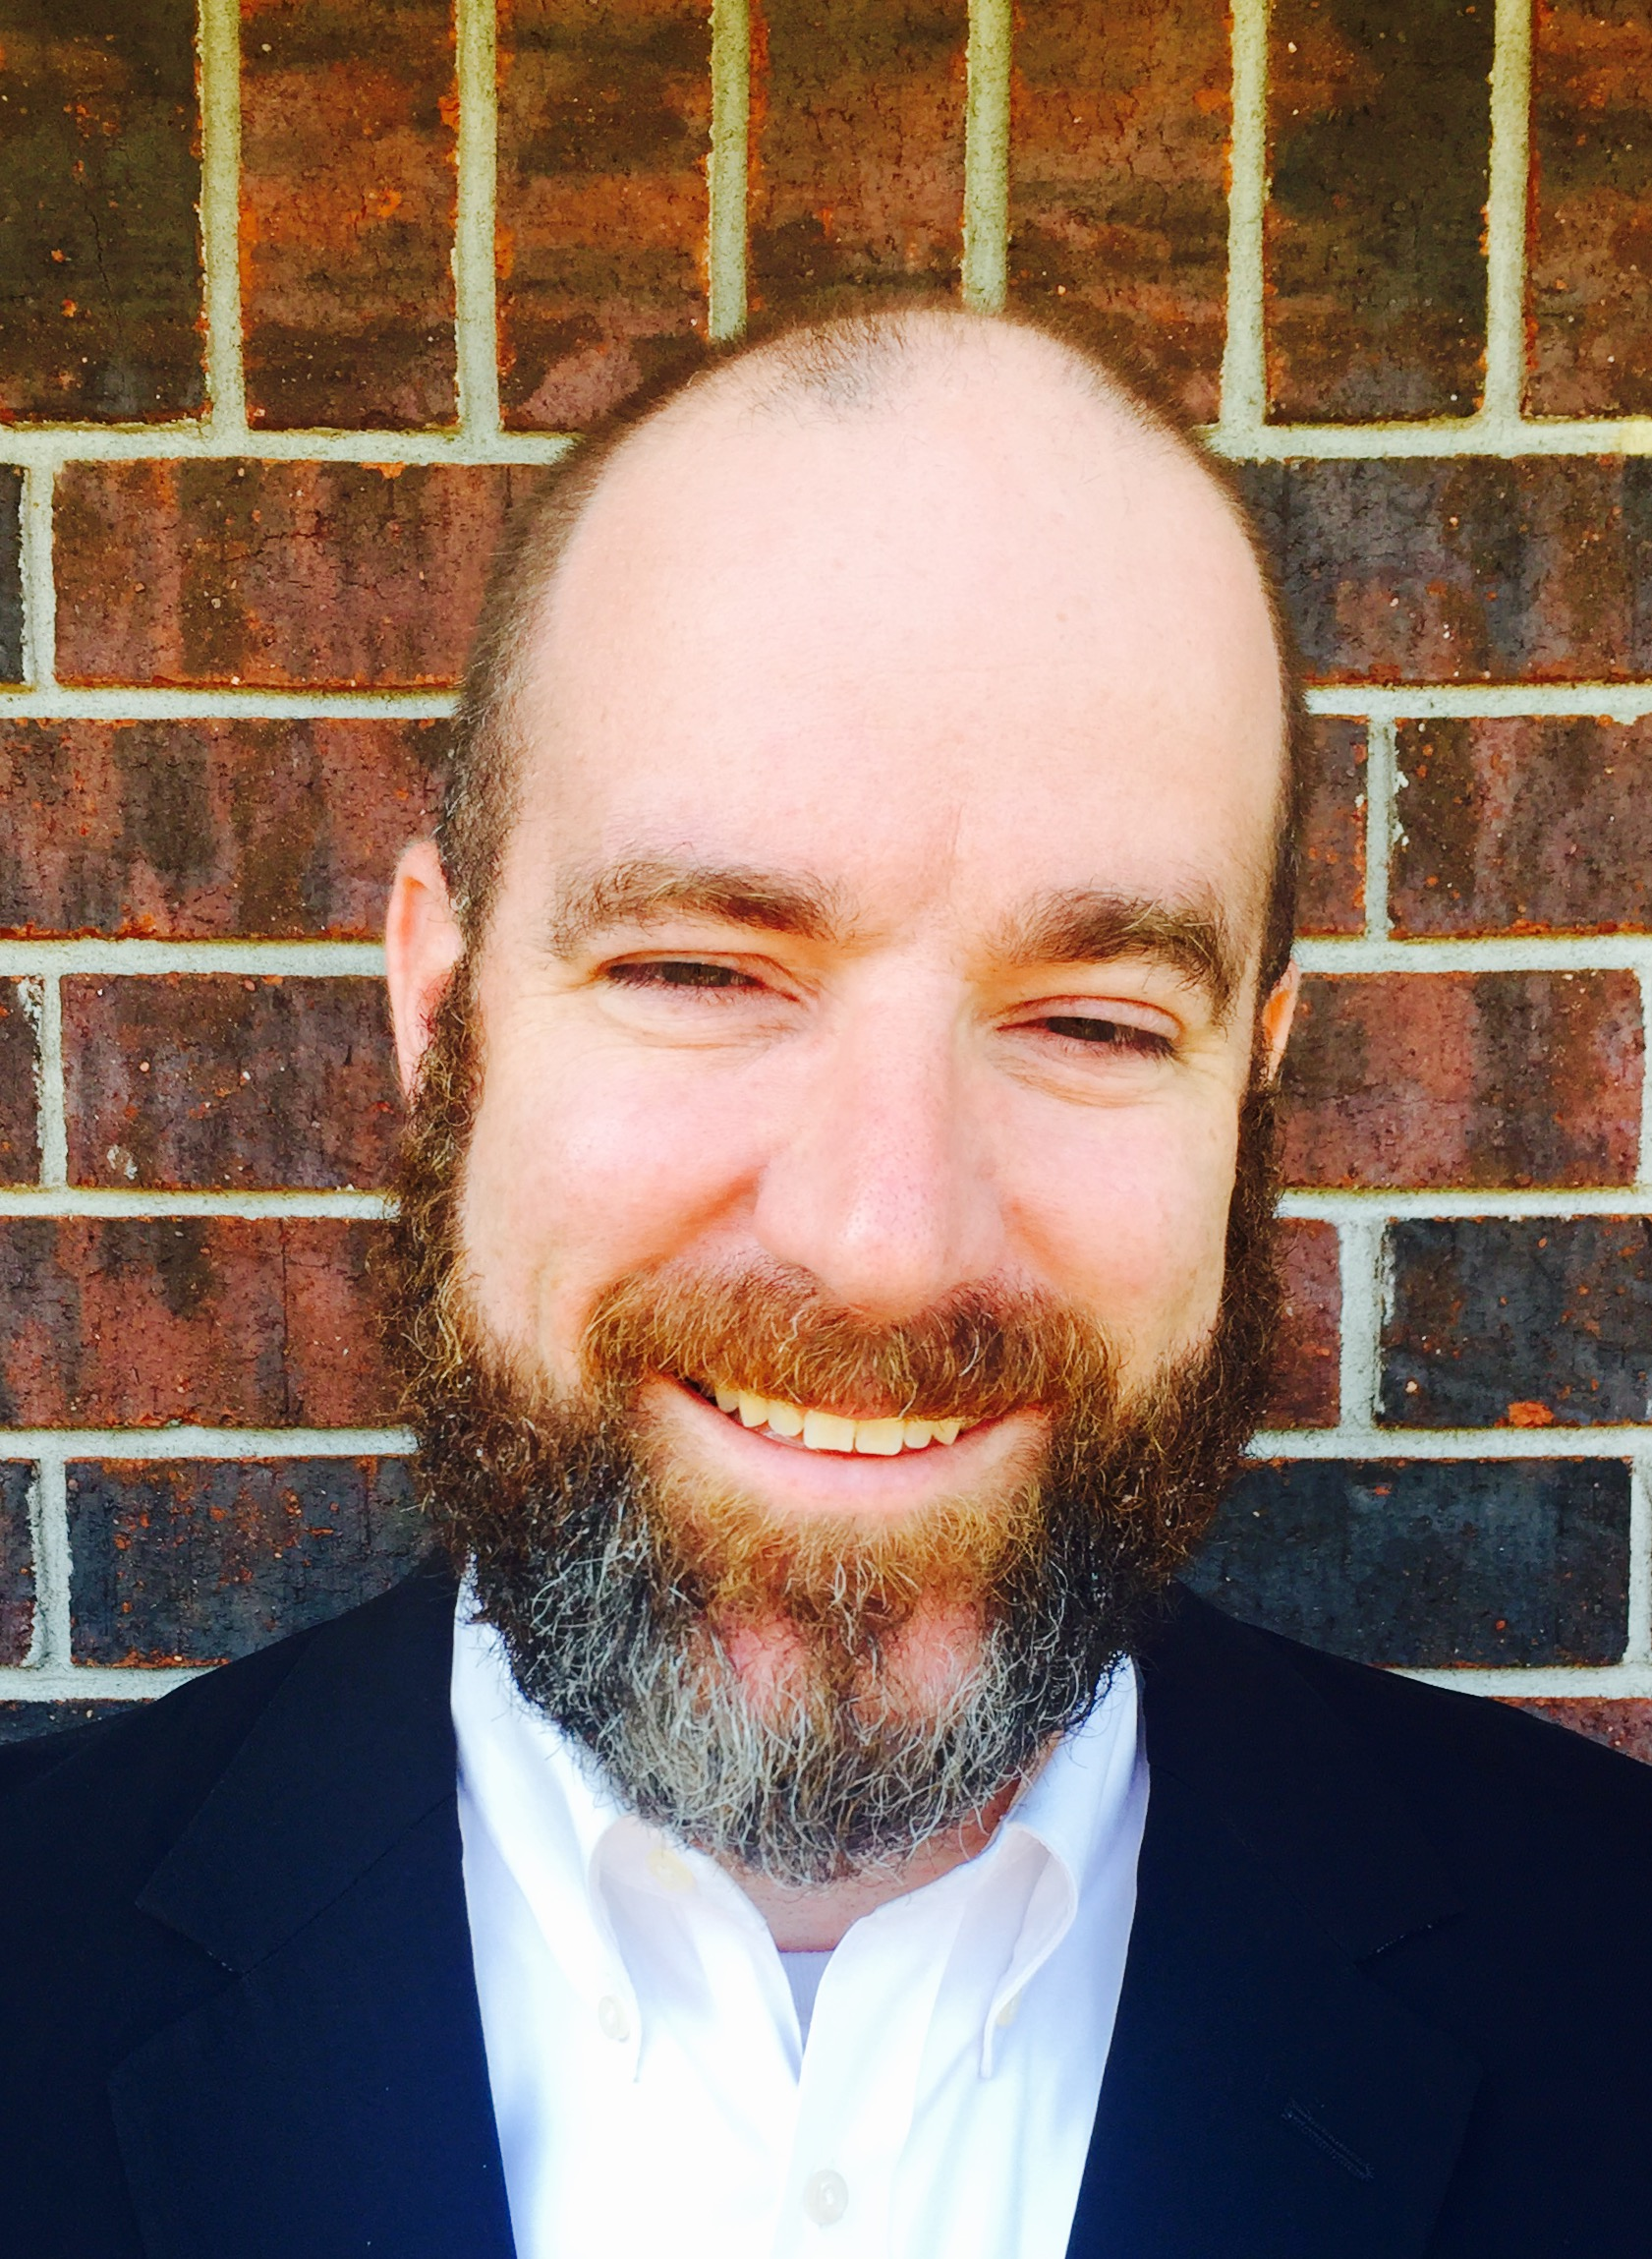 Sam Jeffrey - Security Consultant - Megiddo Operations